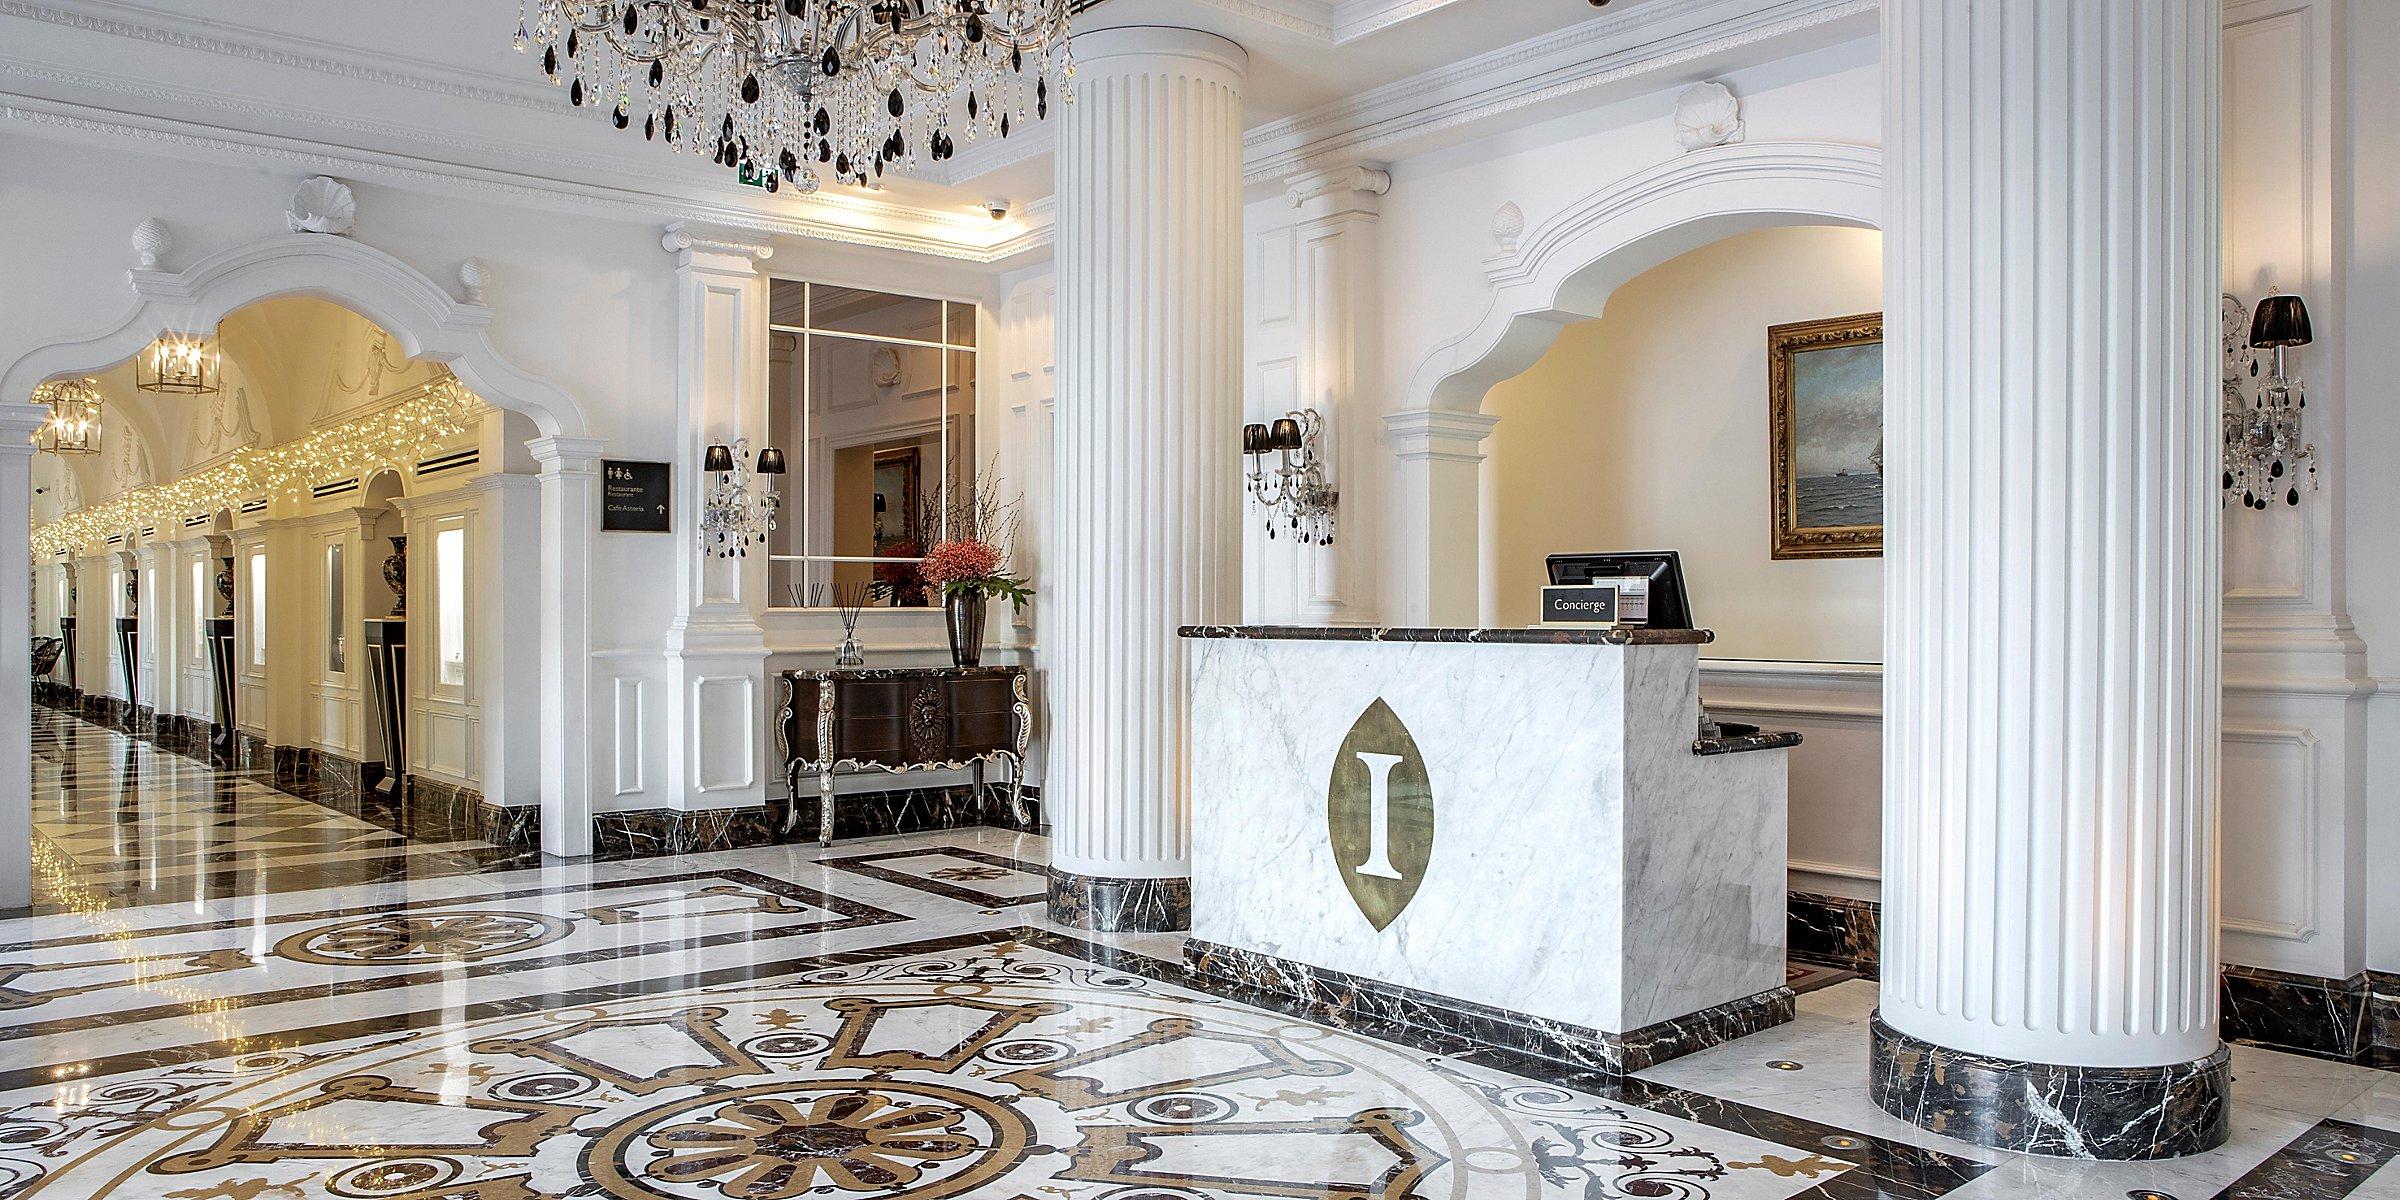 InterContinental Hotel Porto - Palacio das Cardosas